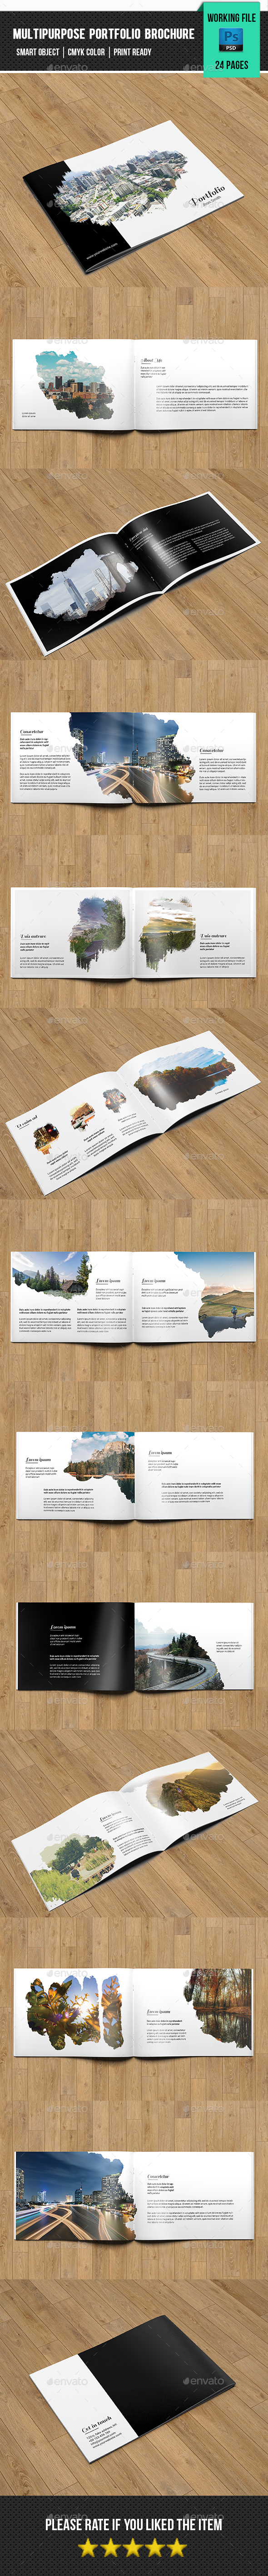 Artistic Photography Catalog/Brochure-V204 - Catalogs Brochures